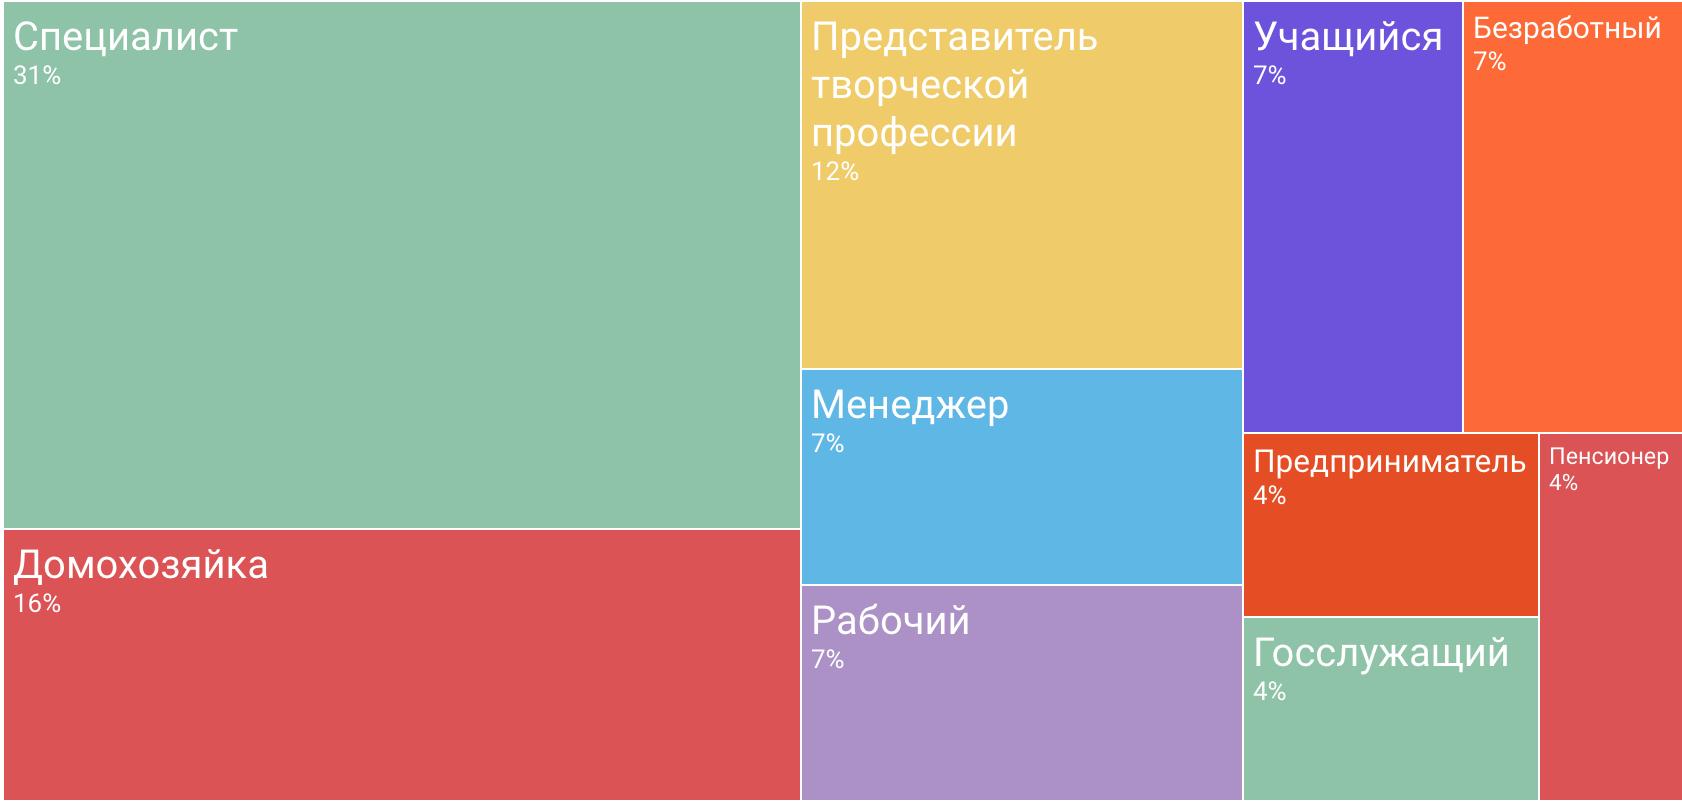 Портрет участника «Дарудара» — инфографика соцопроса - 15